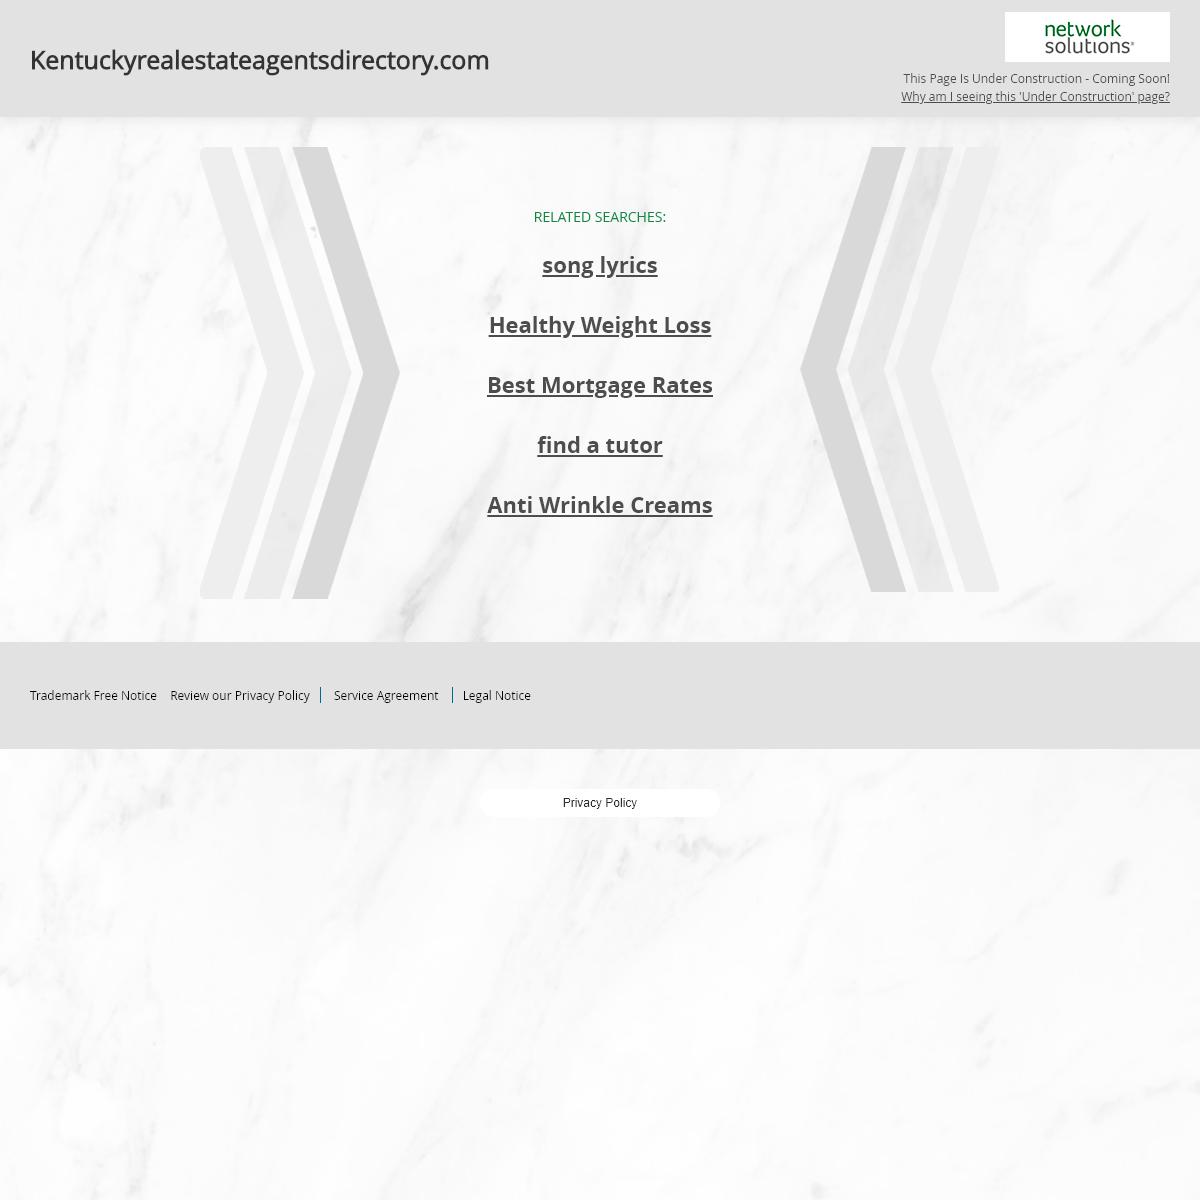 Kentuckyrealestateagentsdirectory.com